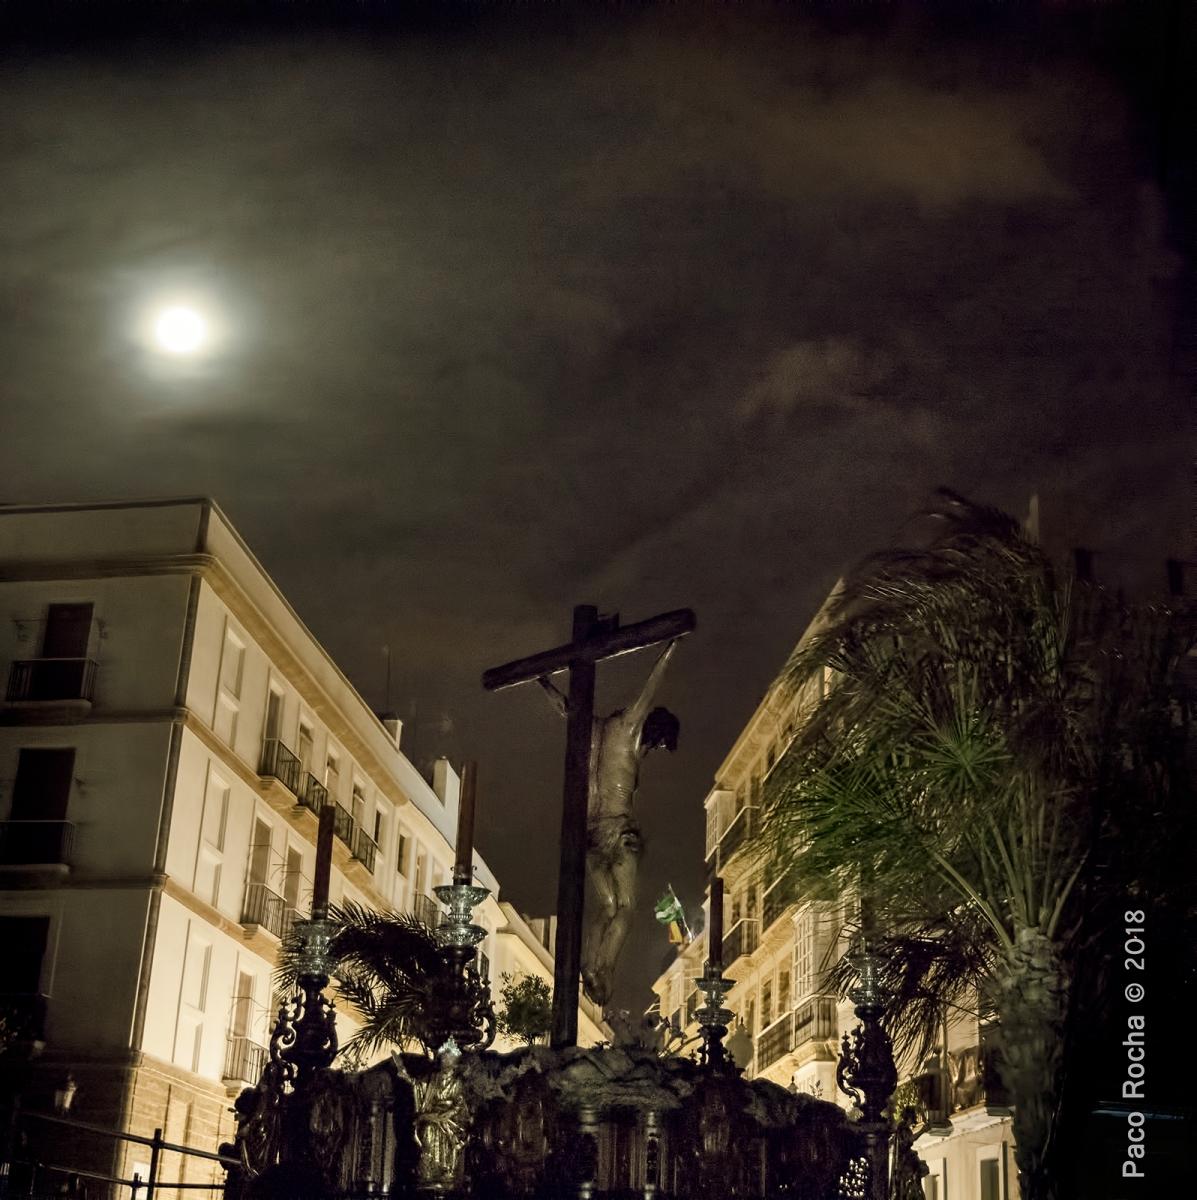 semana santa cadiz paco rocha tercero efe terceroefe penitentes pasos cristos virgen cristo buena muerte